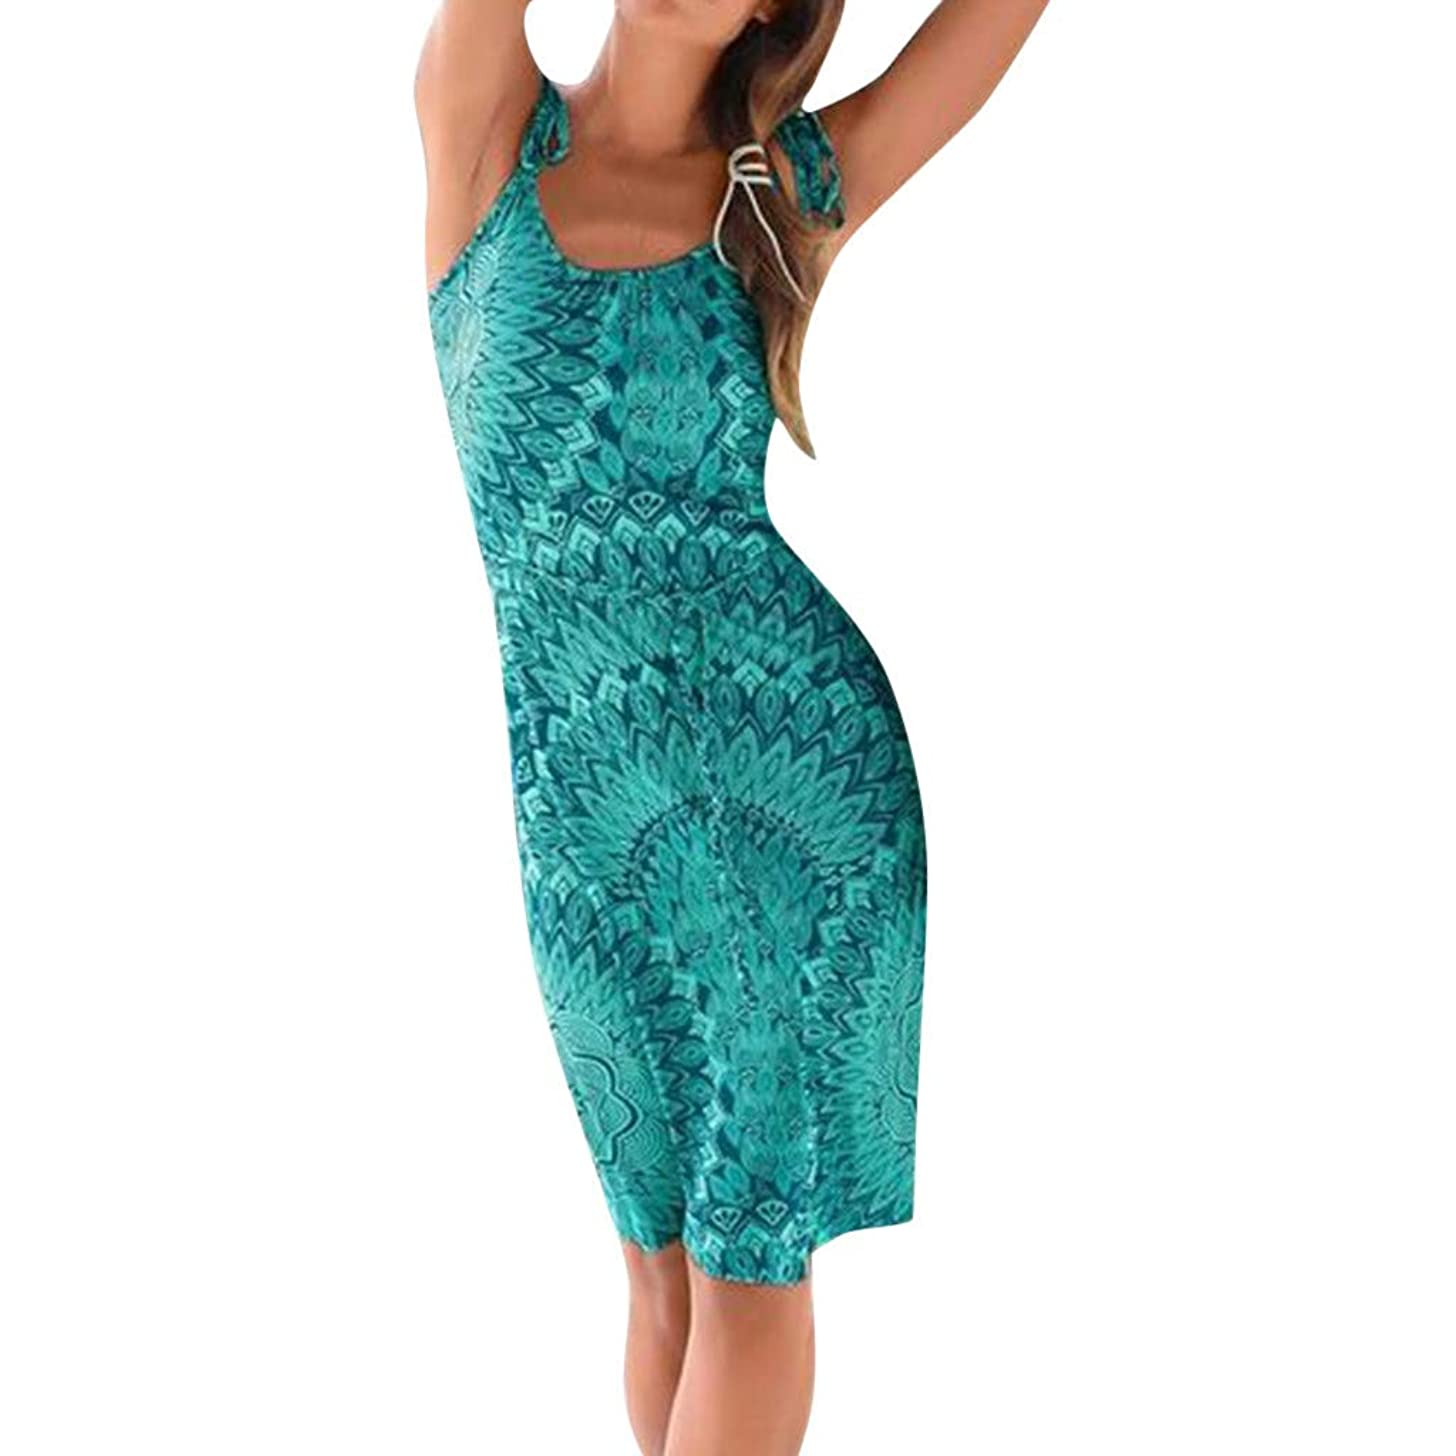 EINCcm Women Boho Floral Print Midi Dress, Slim Fit Beach Dress Casual Strap Dress Soft Summer Dress